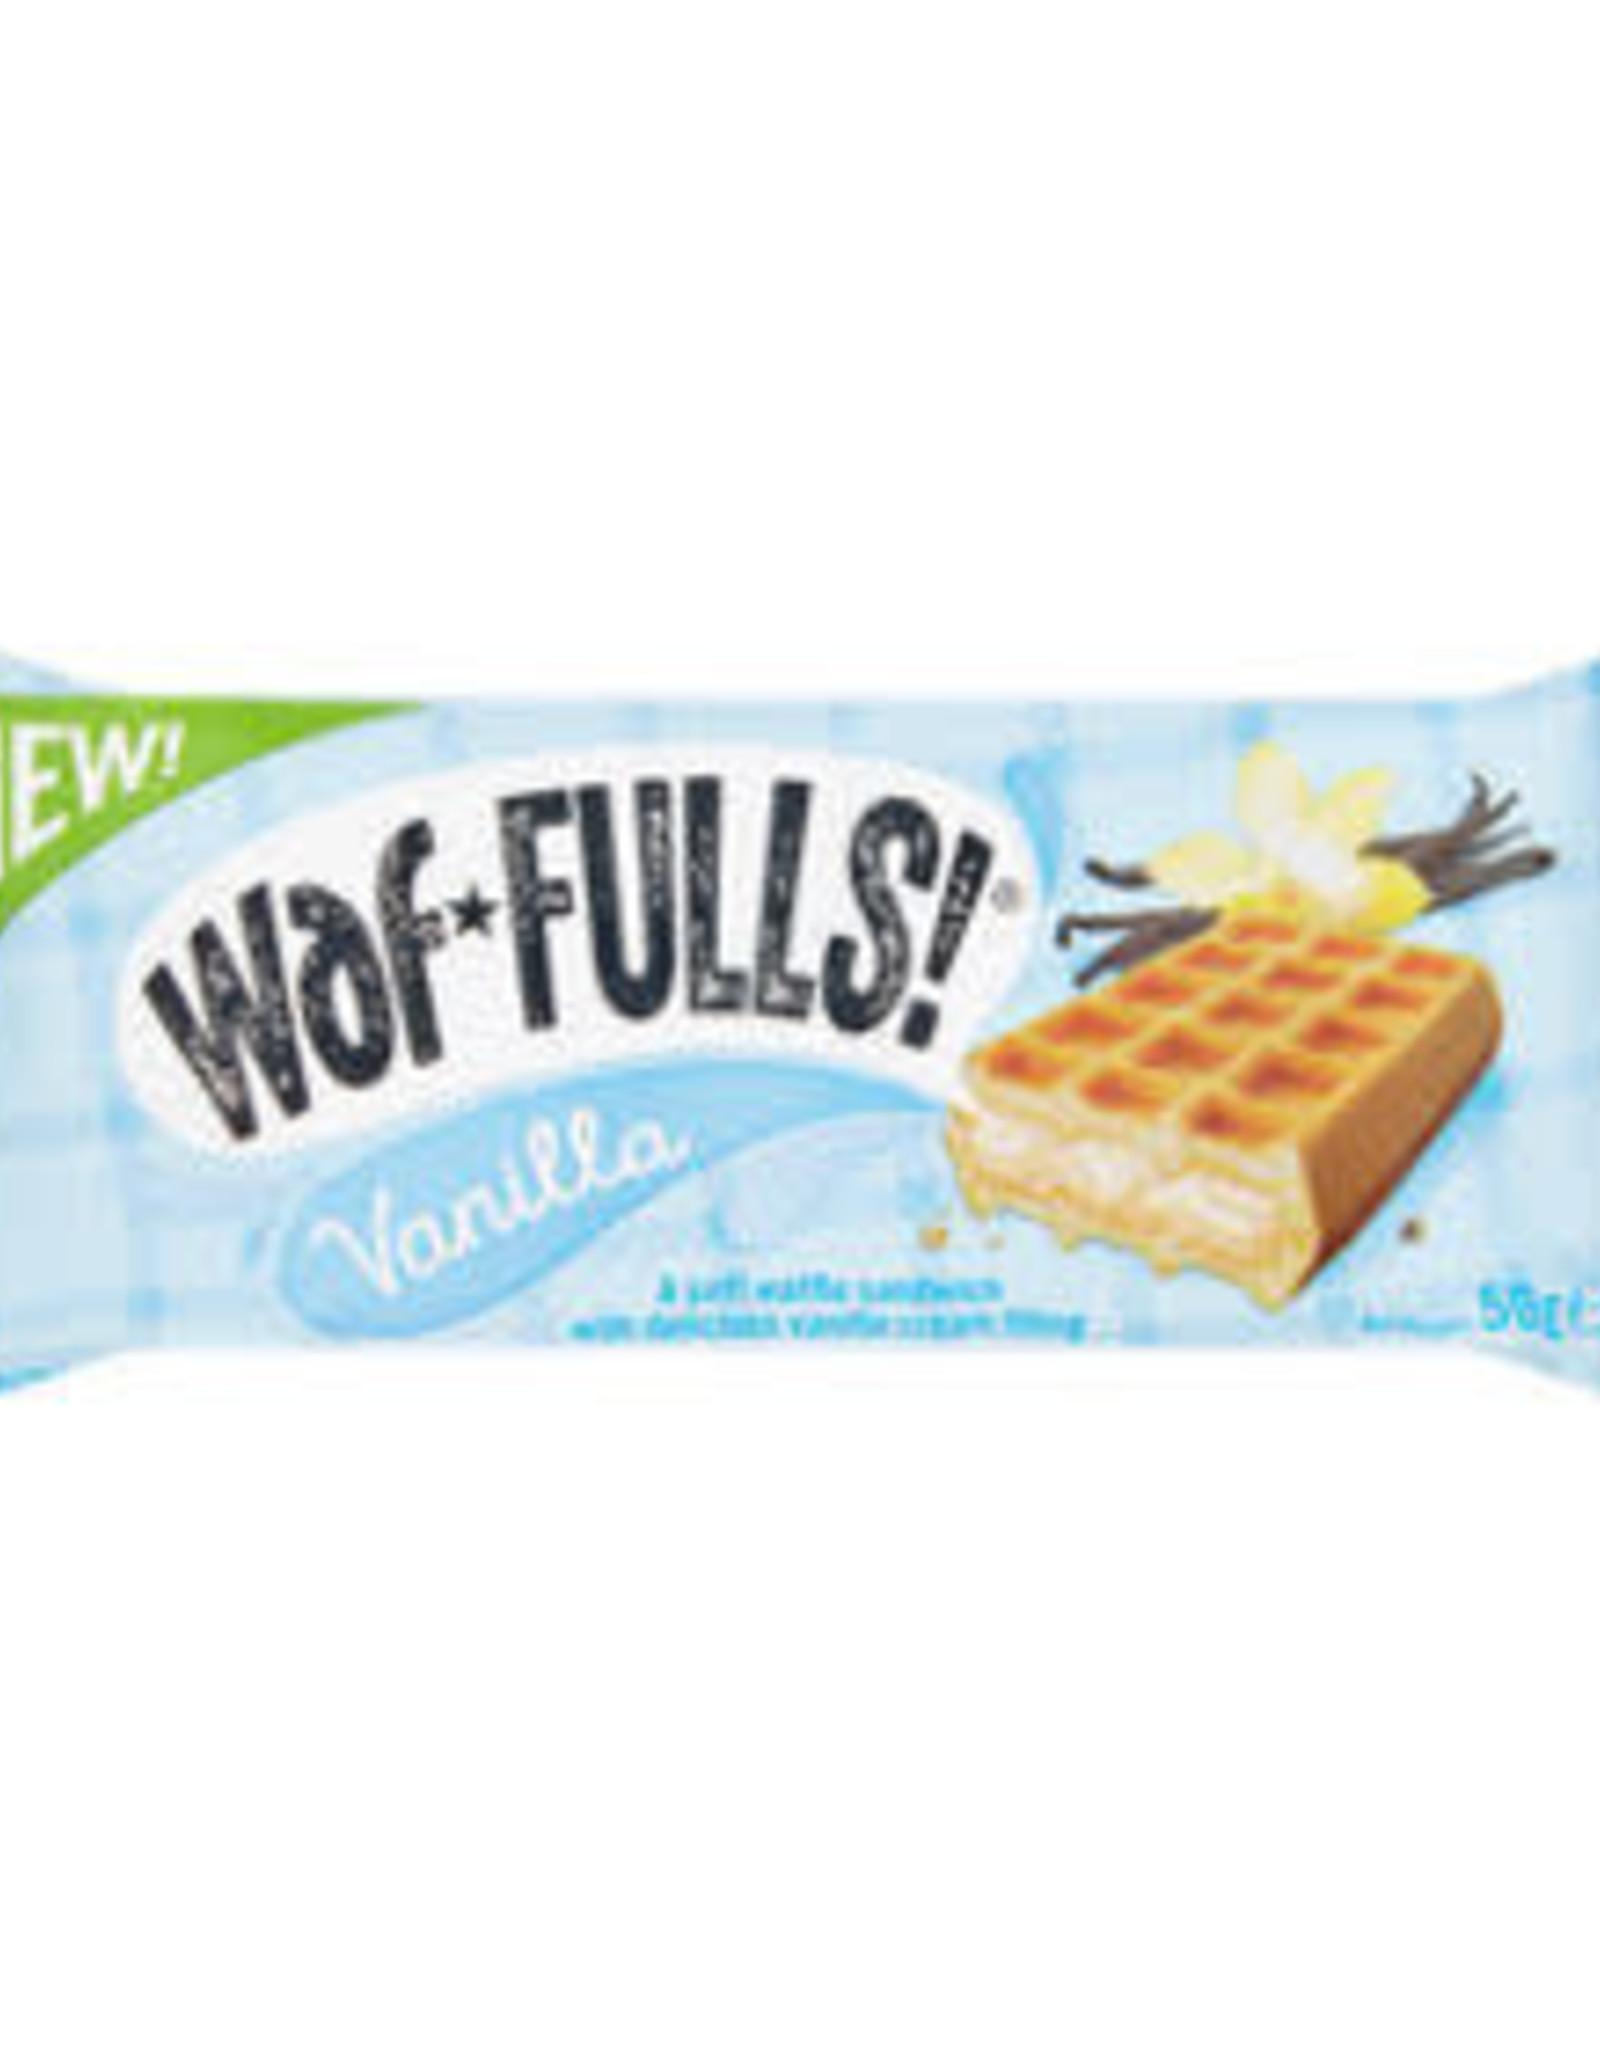 Waf*Full Waffulls Vanilla !